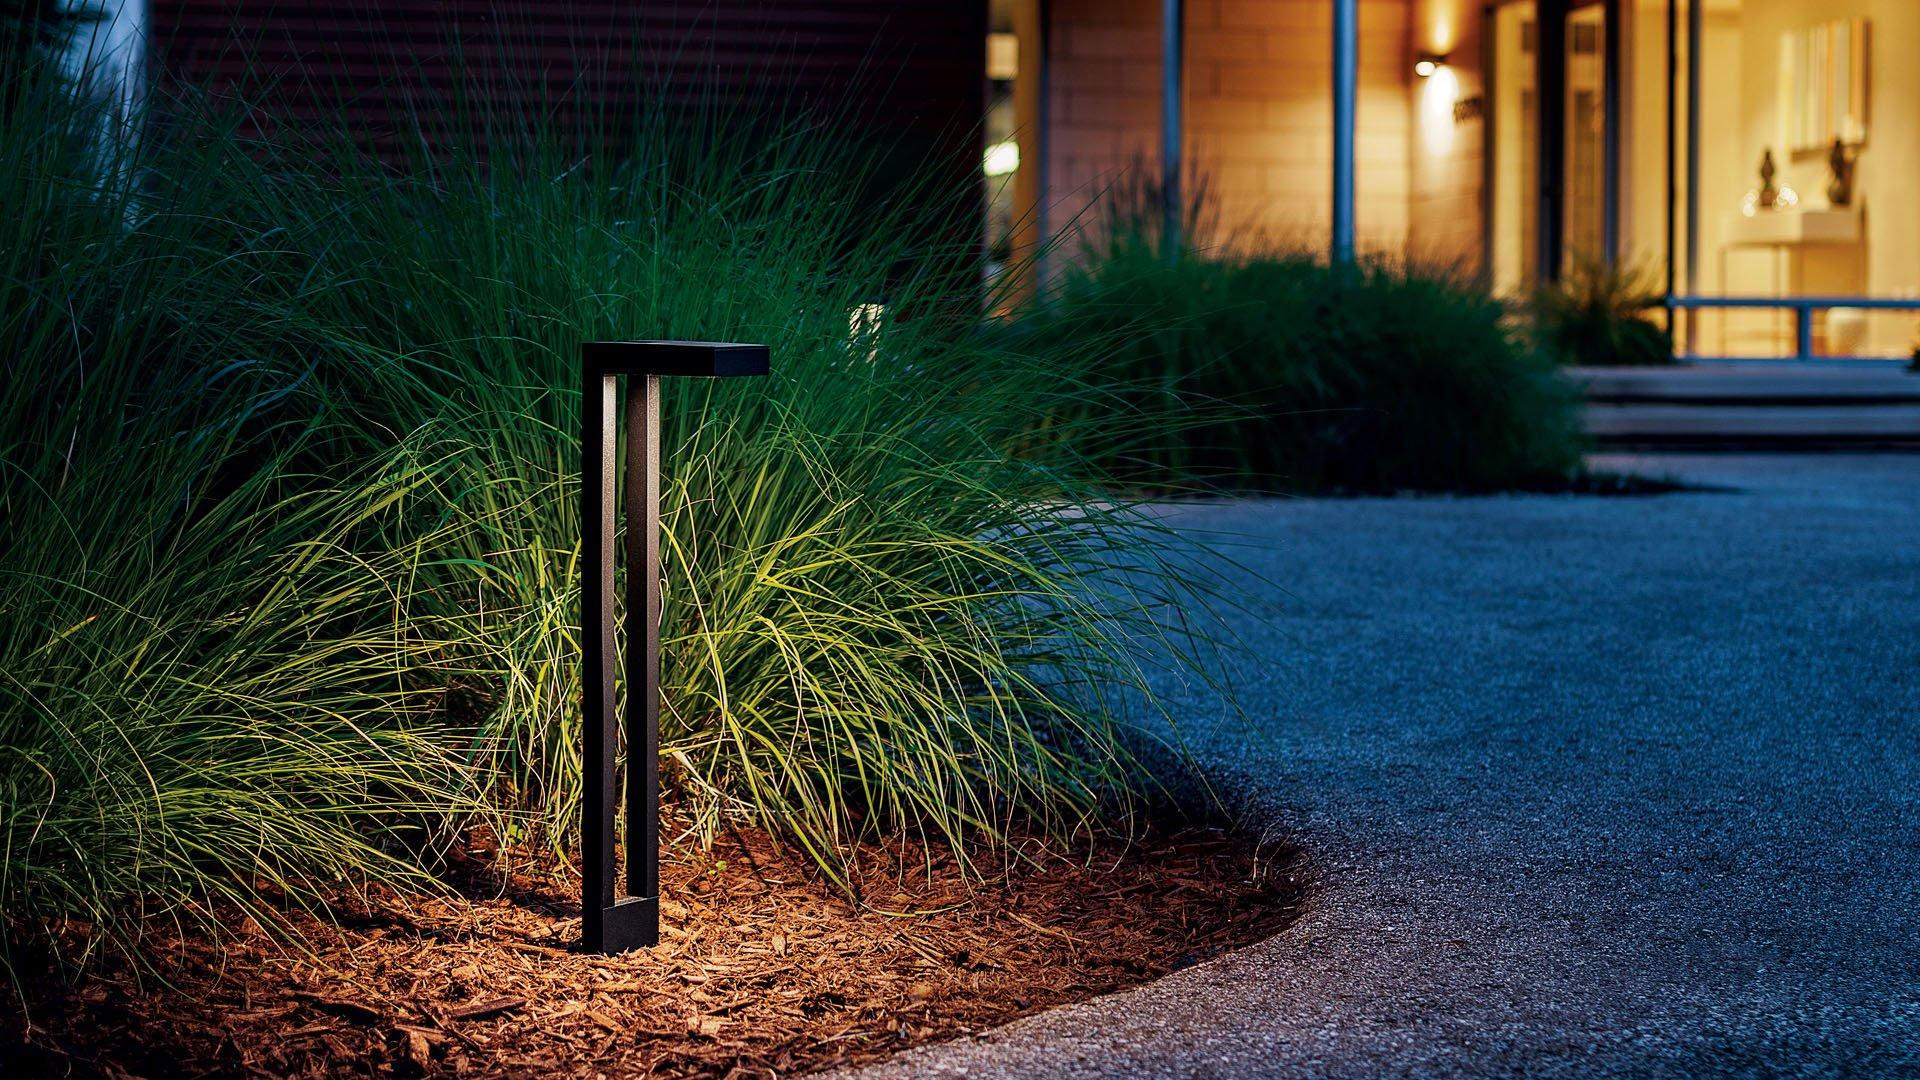 residential-landscape-contemporarypathlight-15844azt-night-mid-1920x10802x